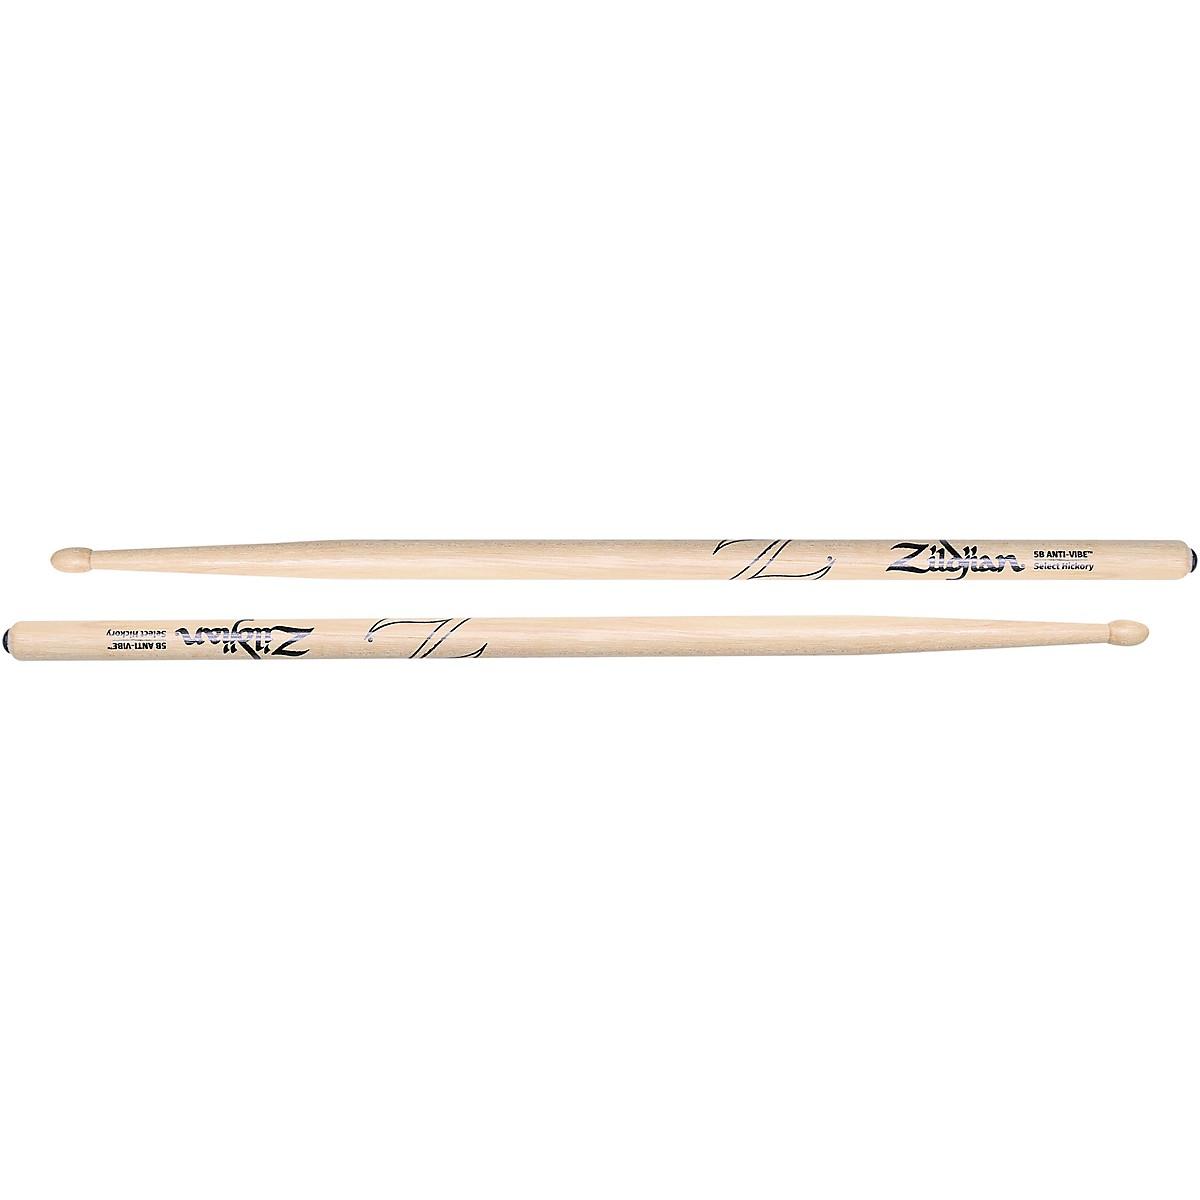 Zildjian Anti-Vibe Drum Sticks